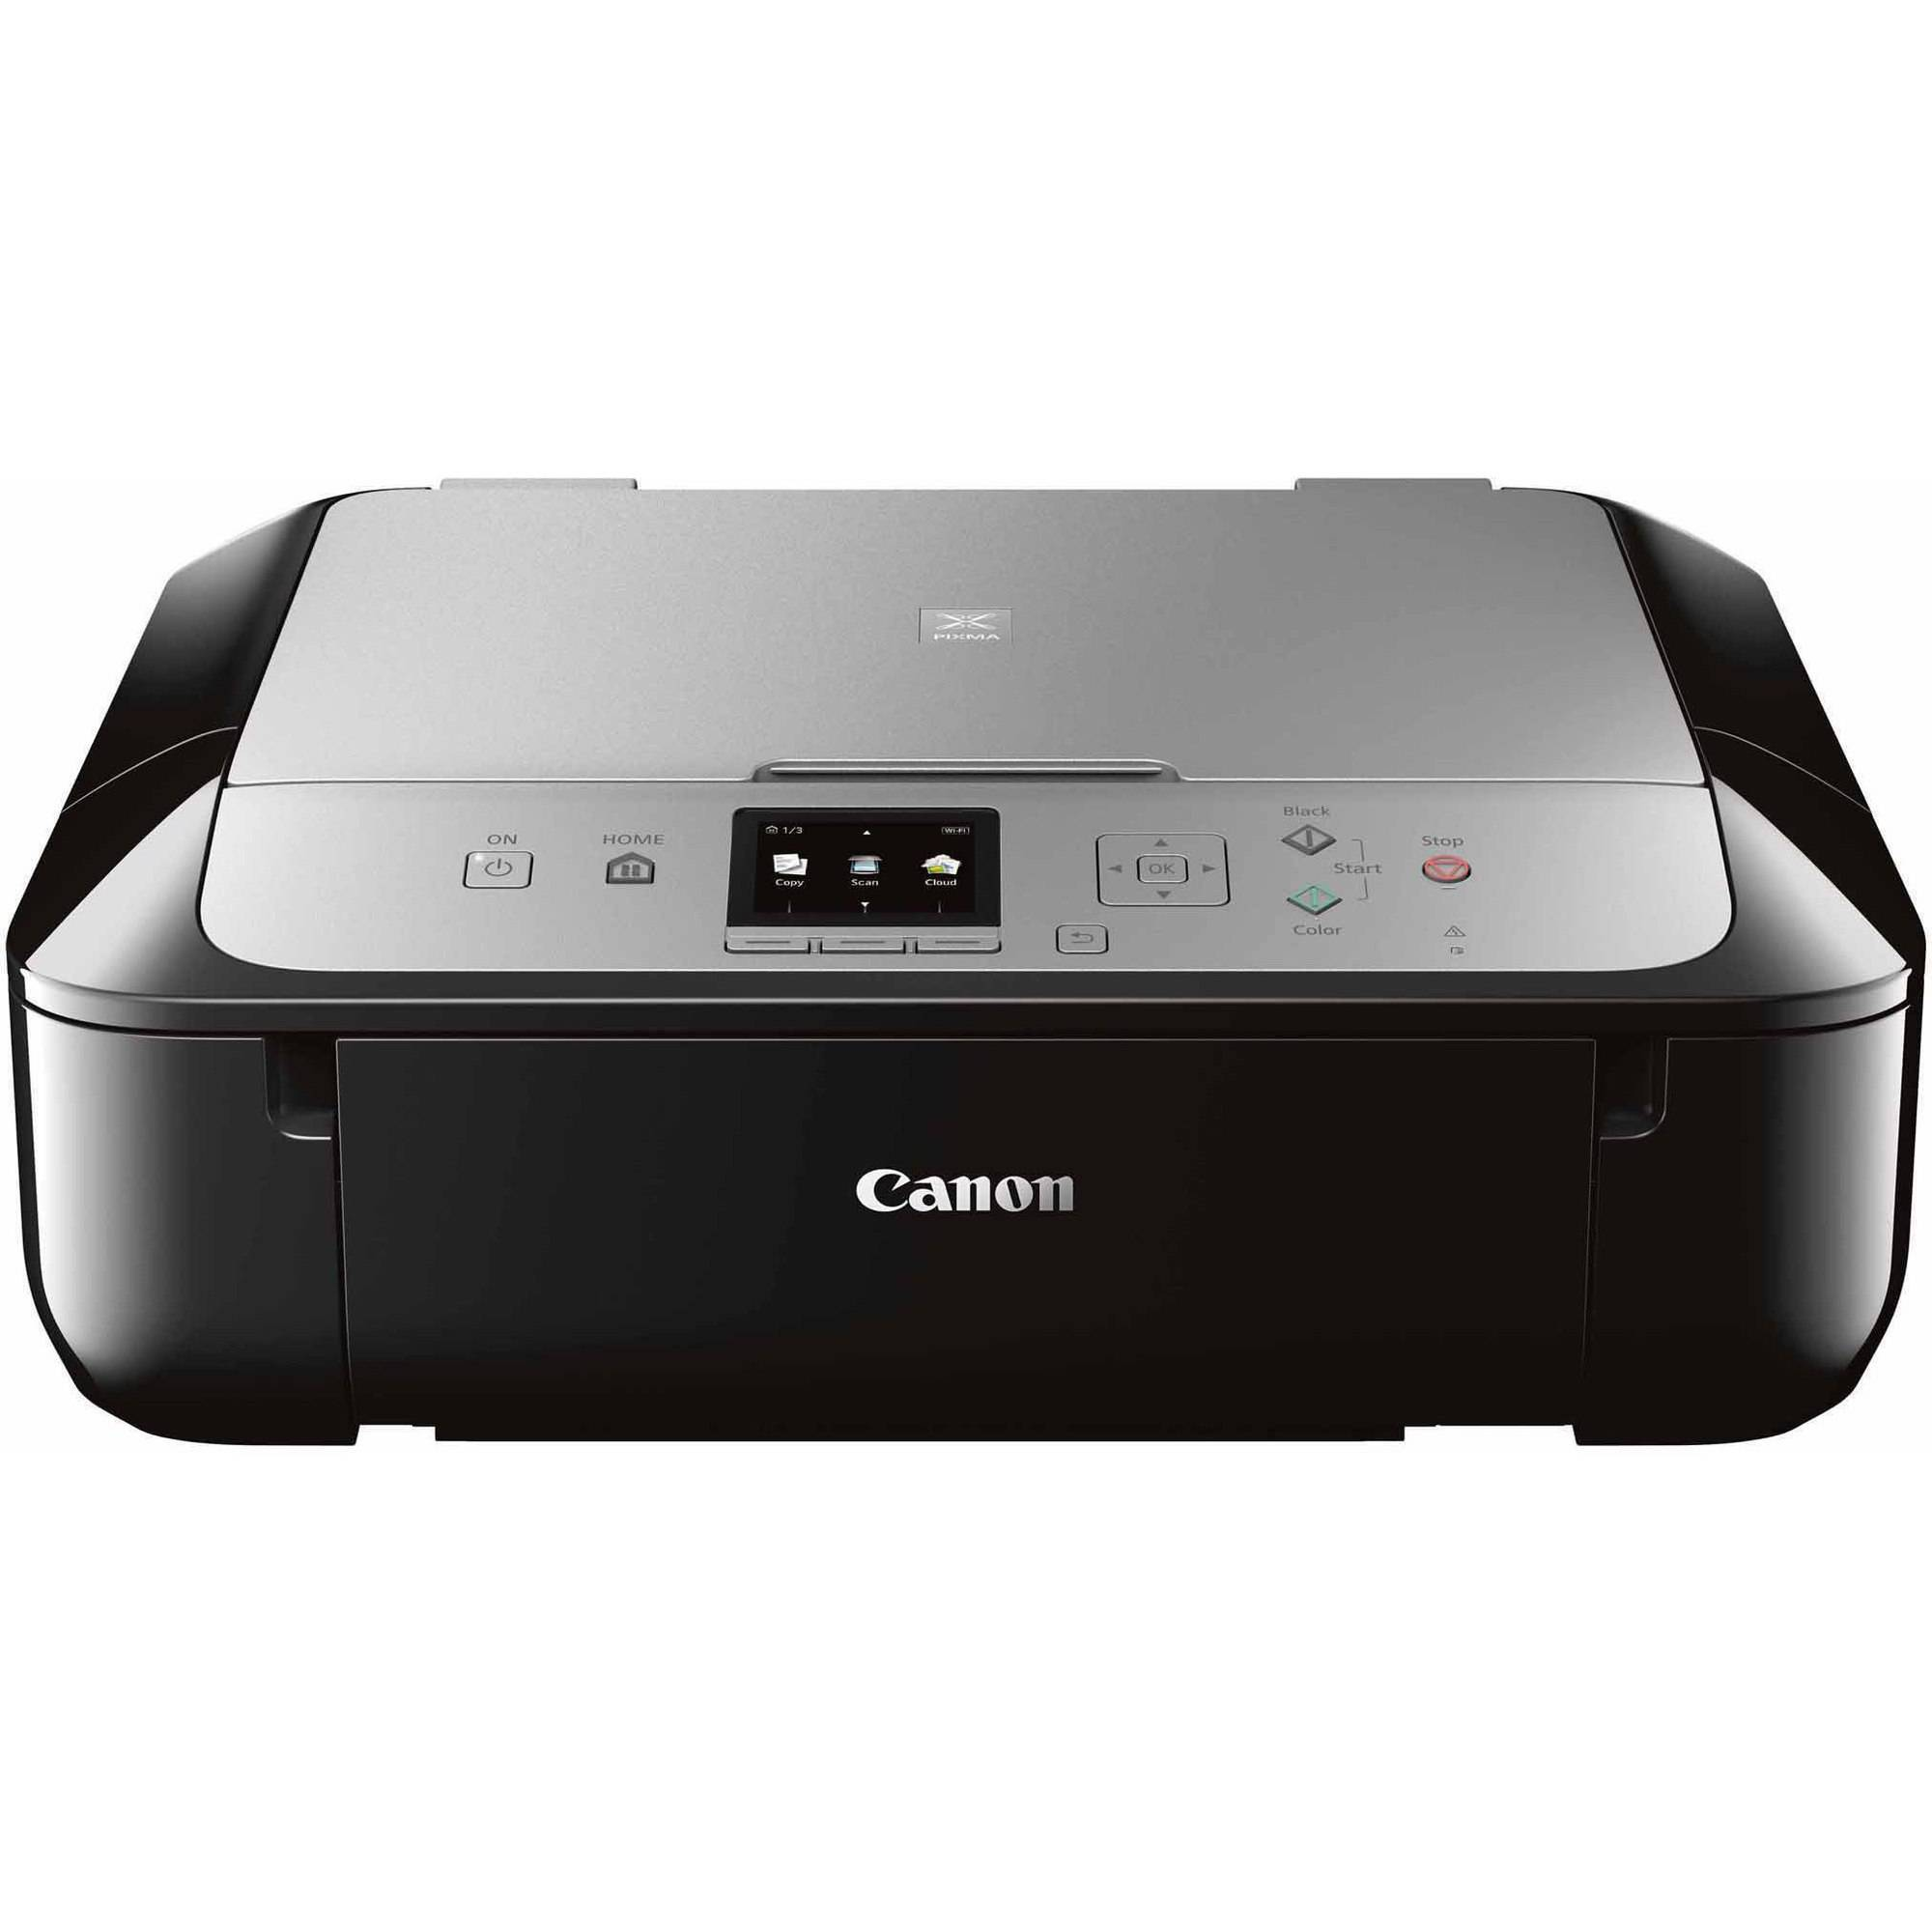 Canon PIXMA MG5721 Wireless Inkjet All-in-One Printer/Copier/Scanner, Black/Silver